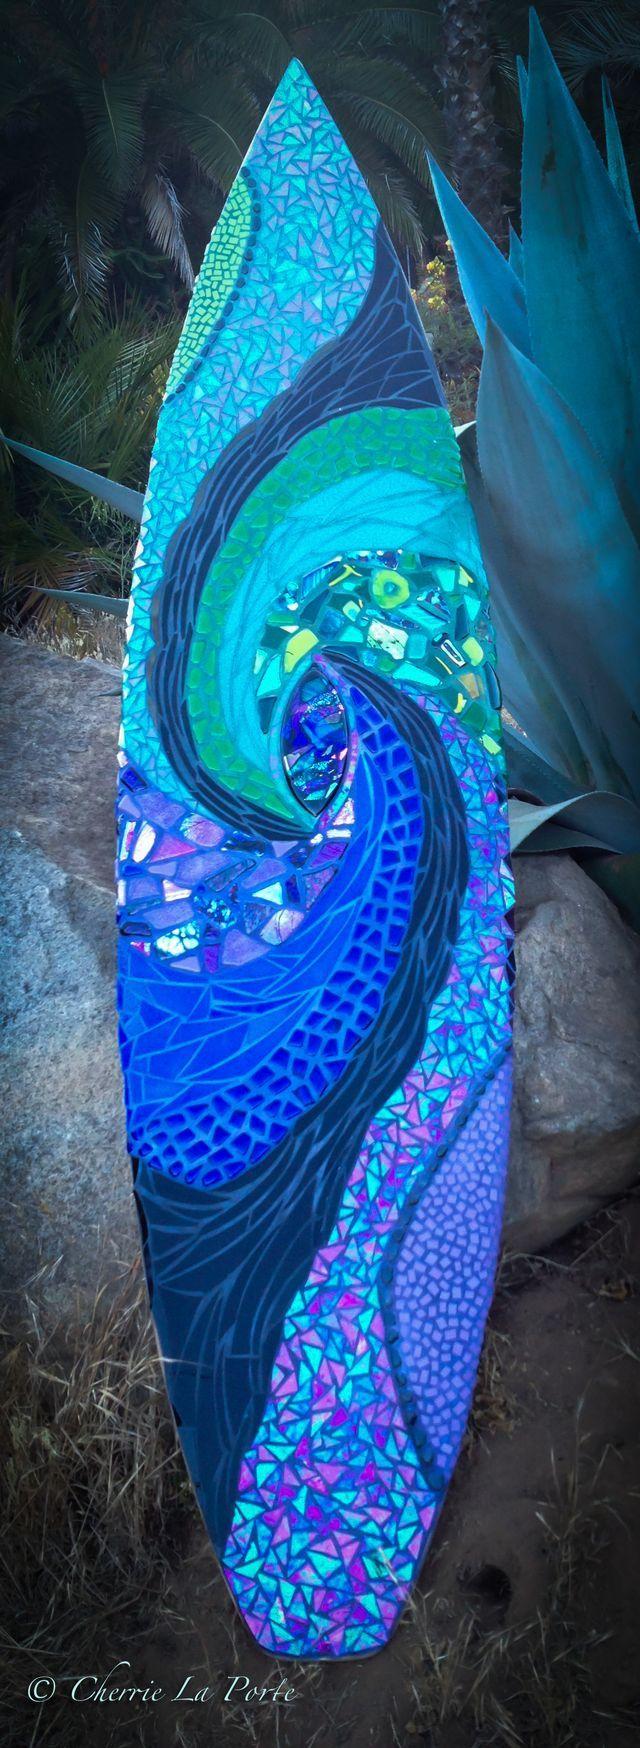 32 best DIY images on Pinterest | Board art, Surf art and Surfboard art